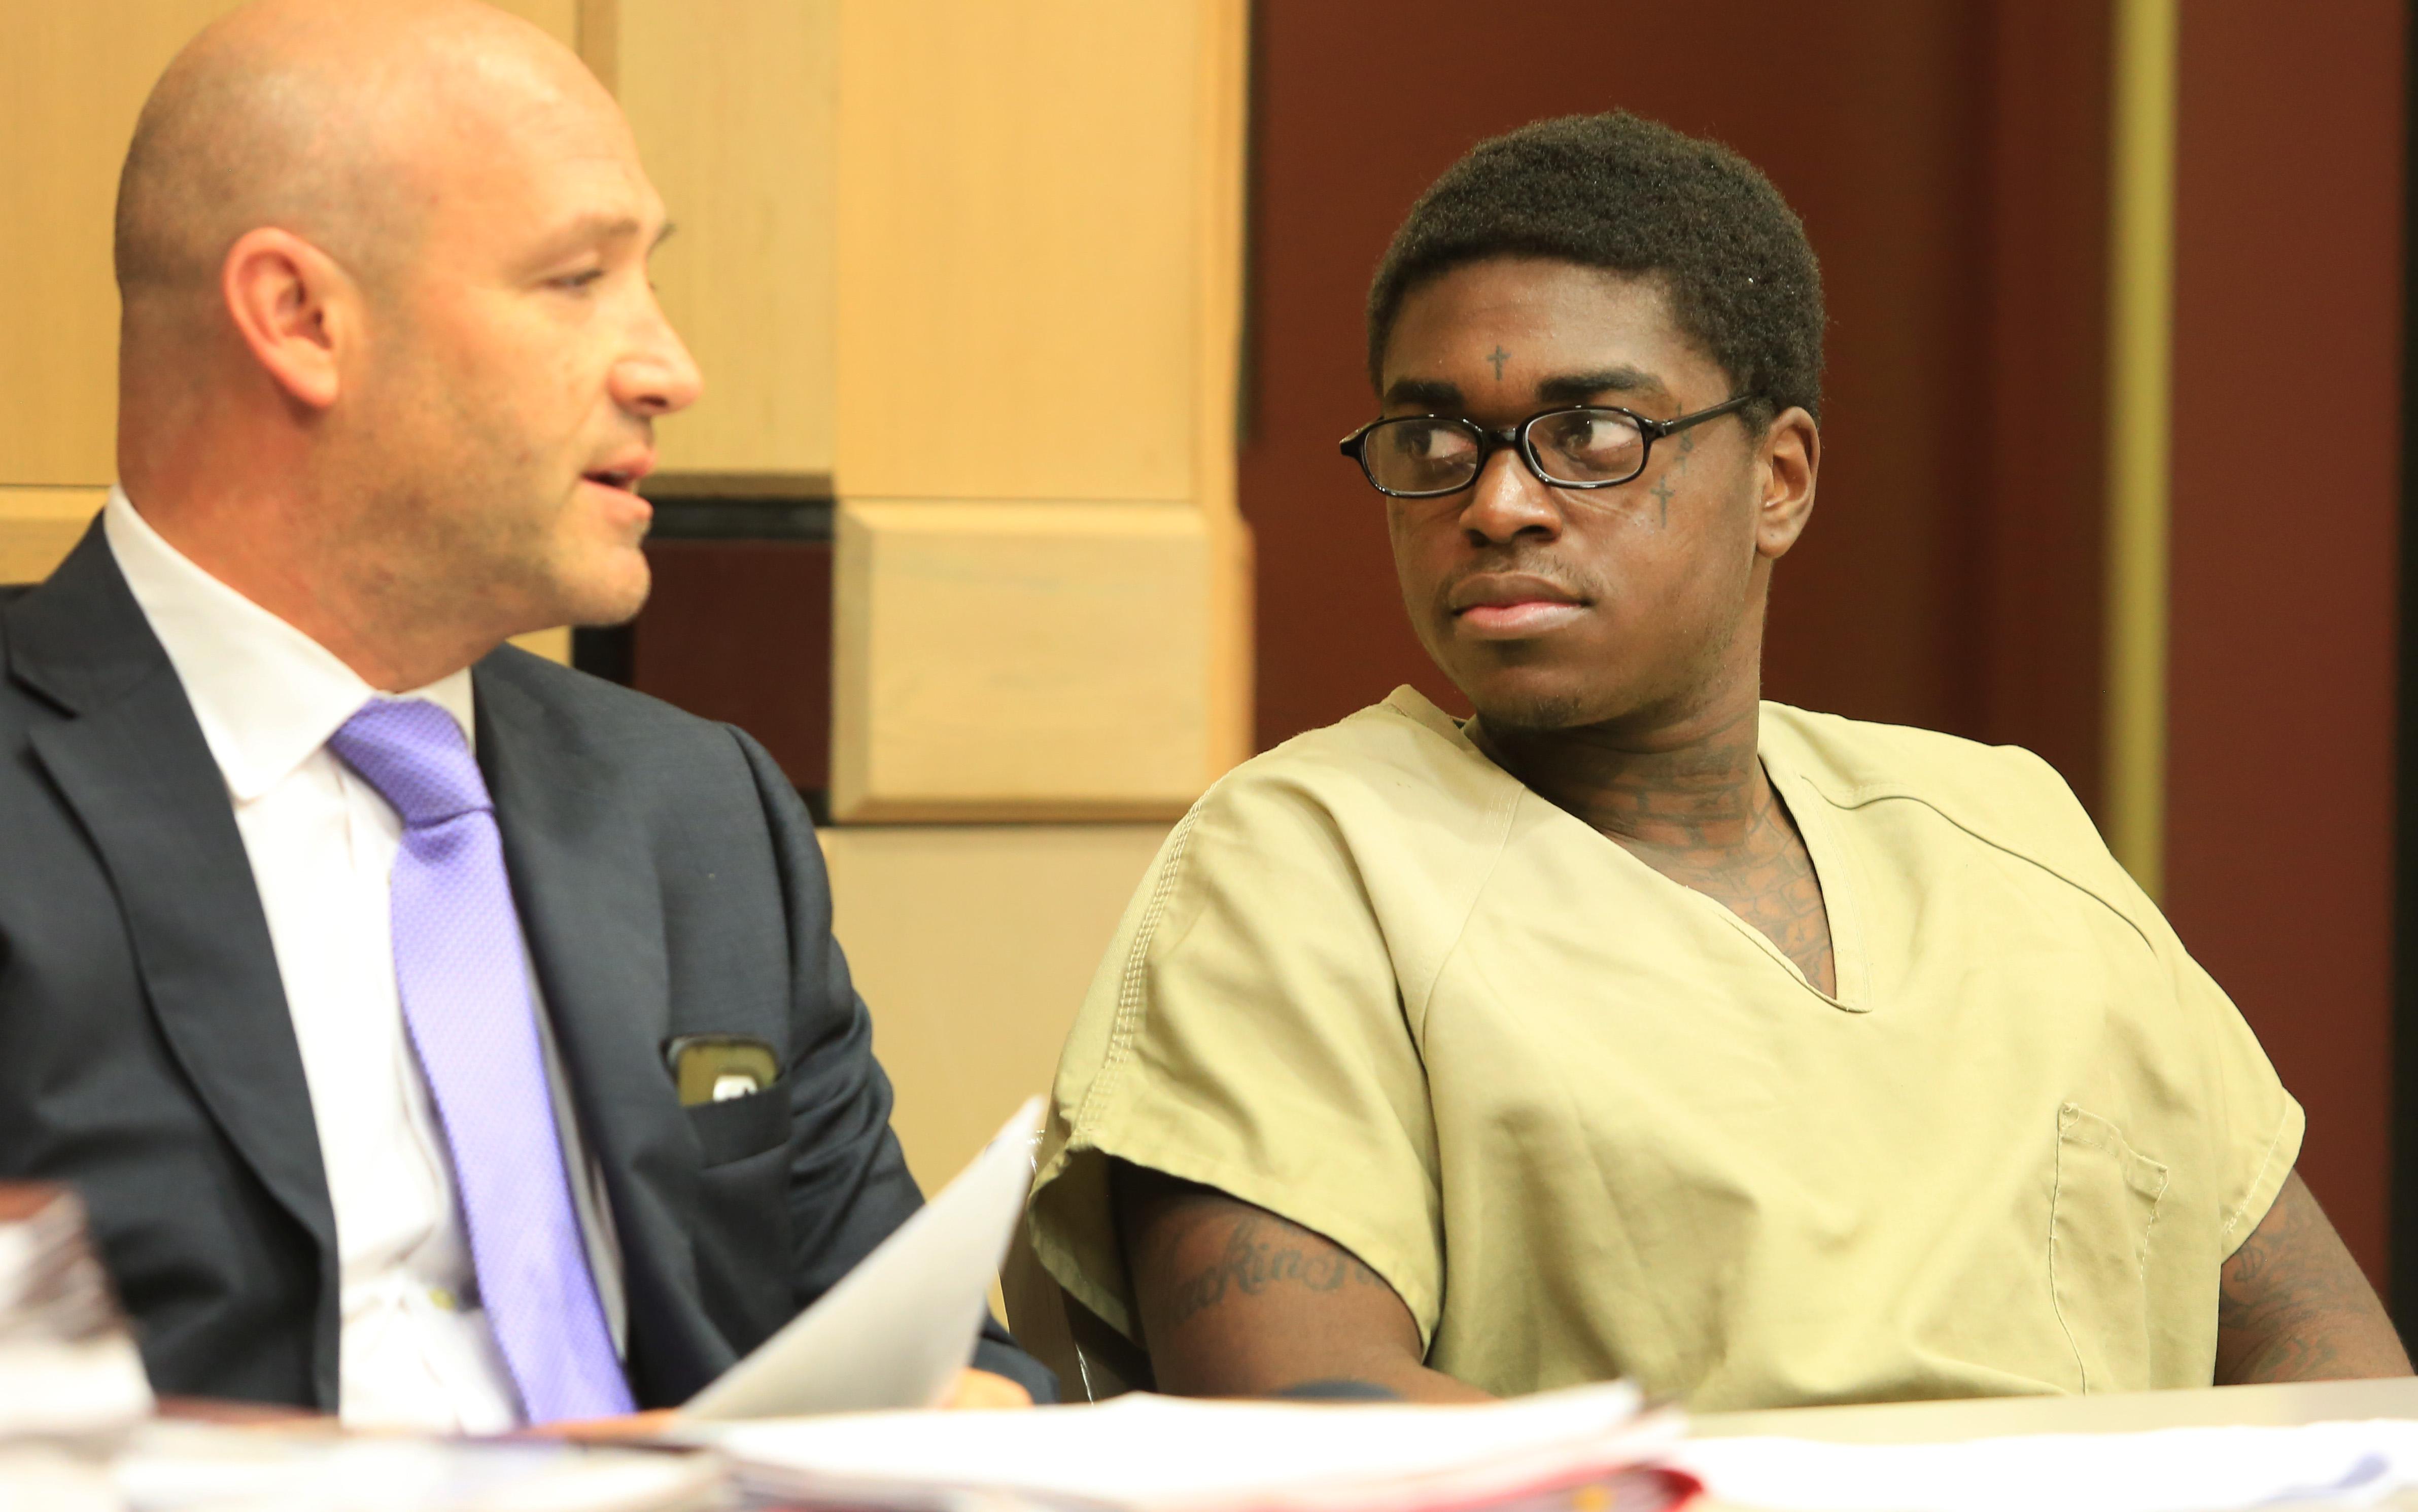 Rapper Kodak Black at sentencing